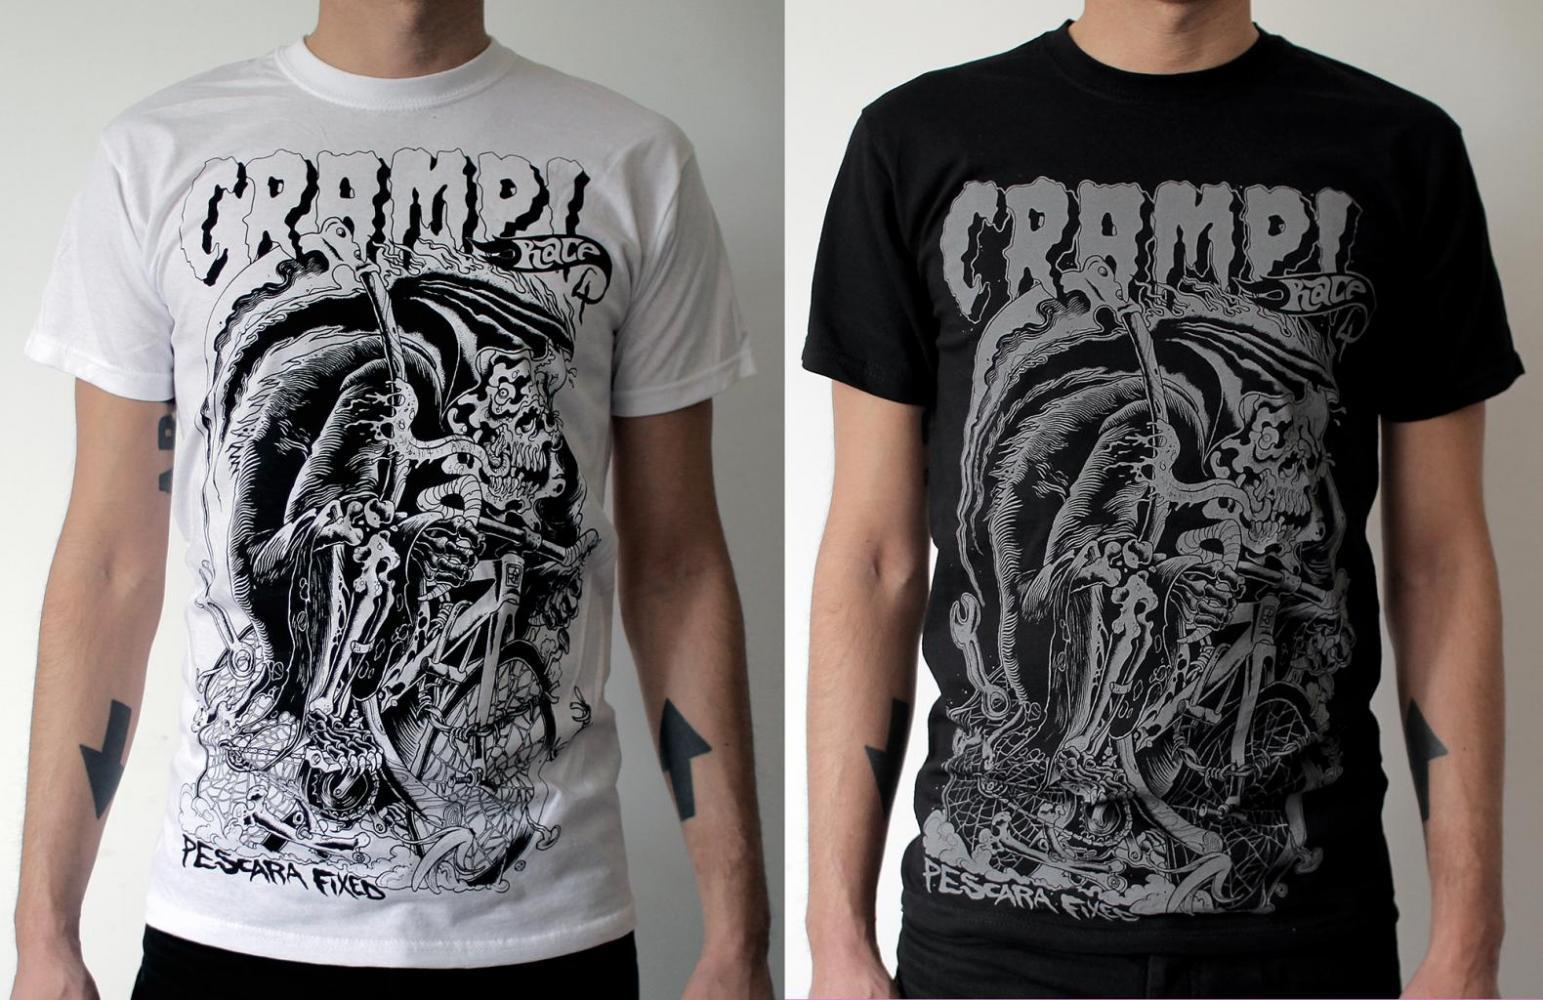 crampi_double_tshirt.thumb.jpg.bf9347aeac238762fdfb7aa7d9c27456.jpg